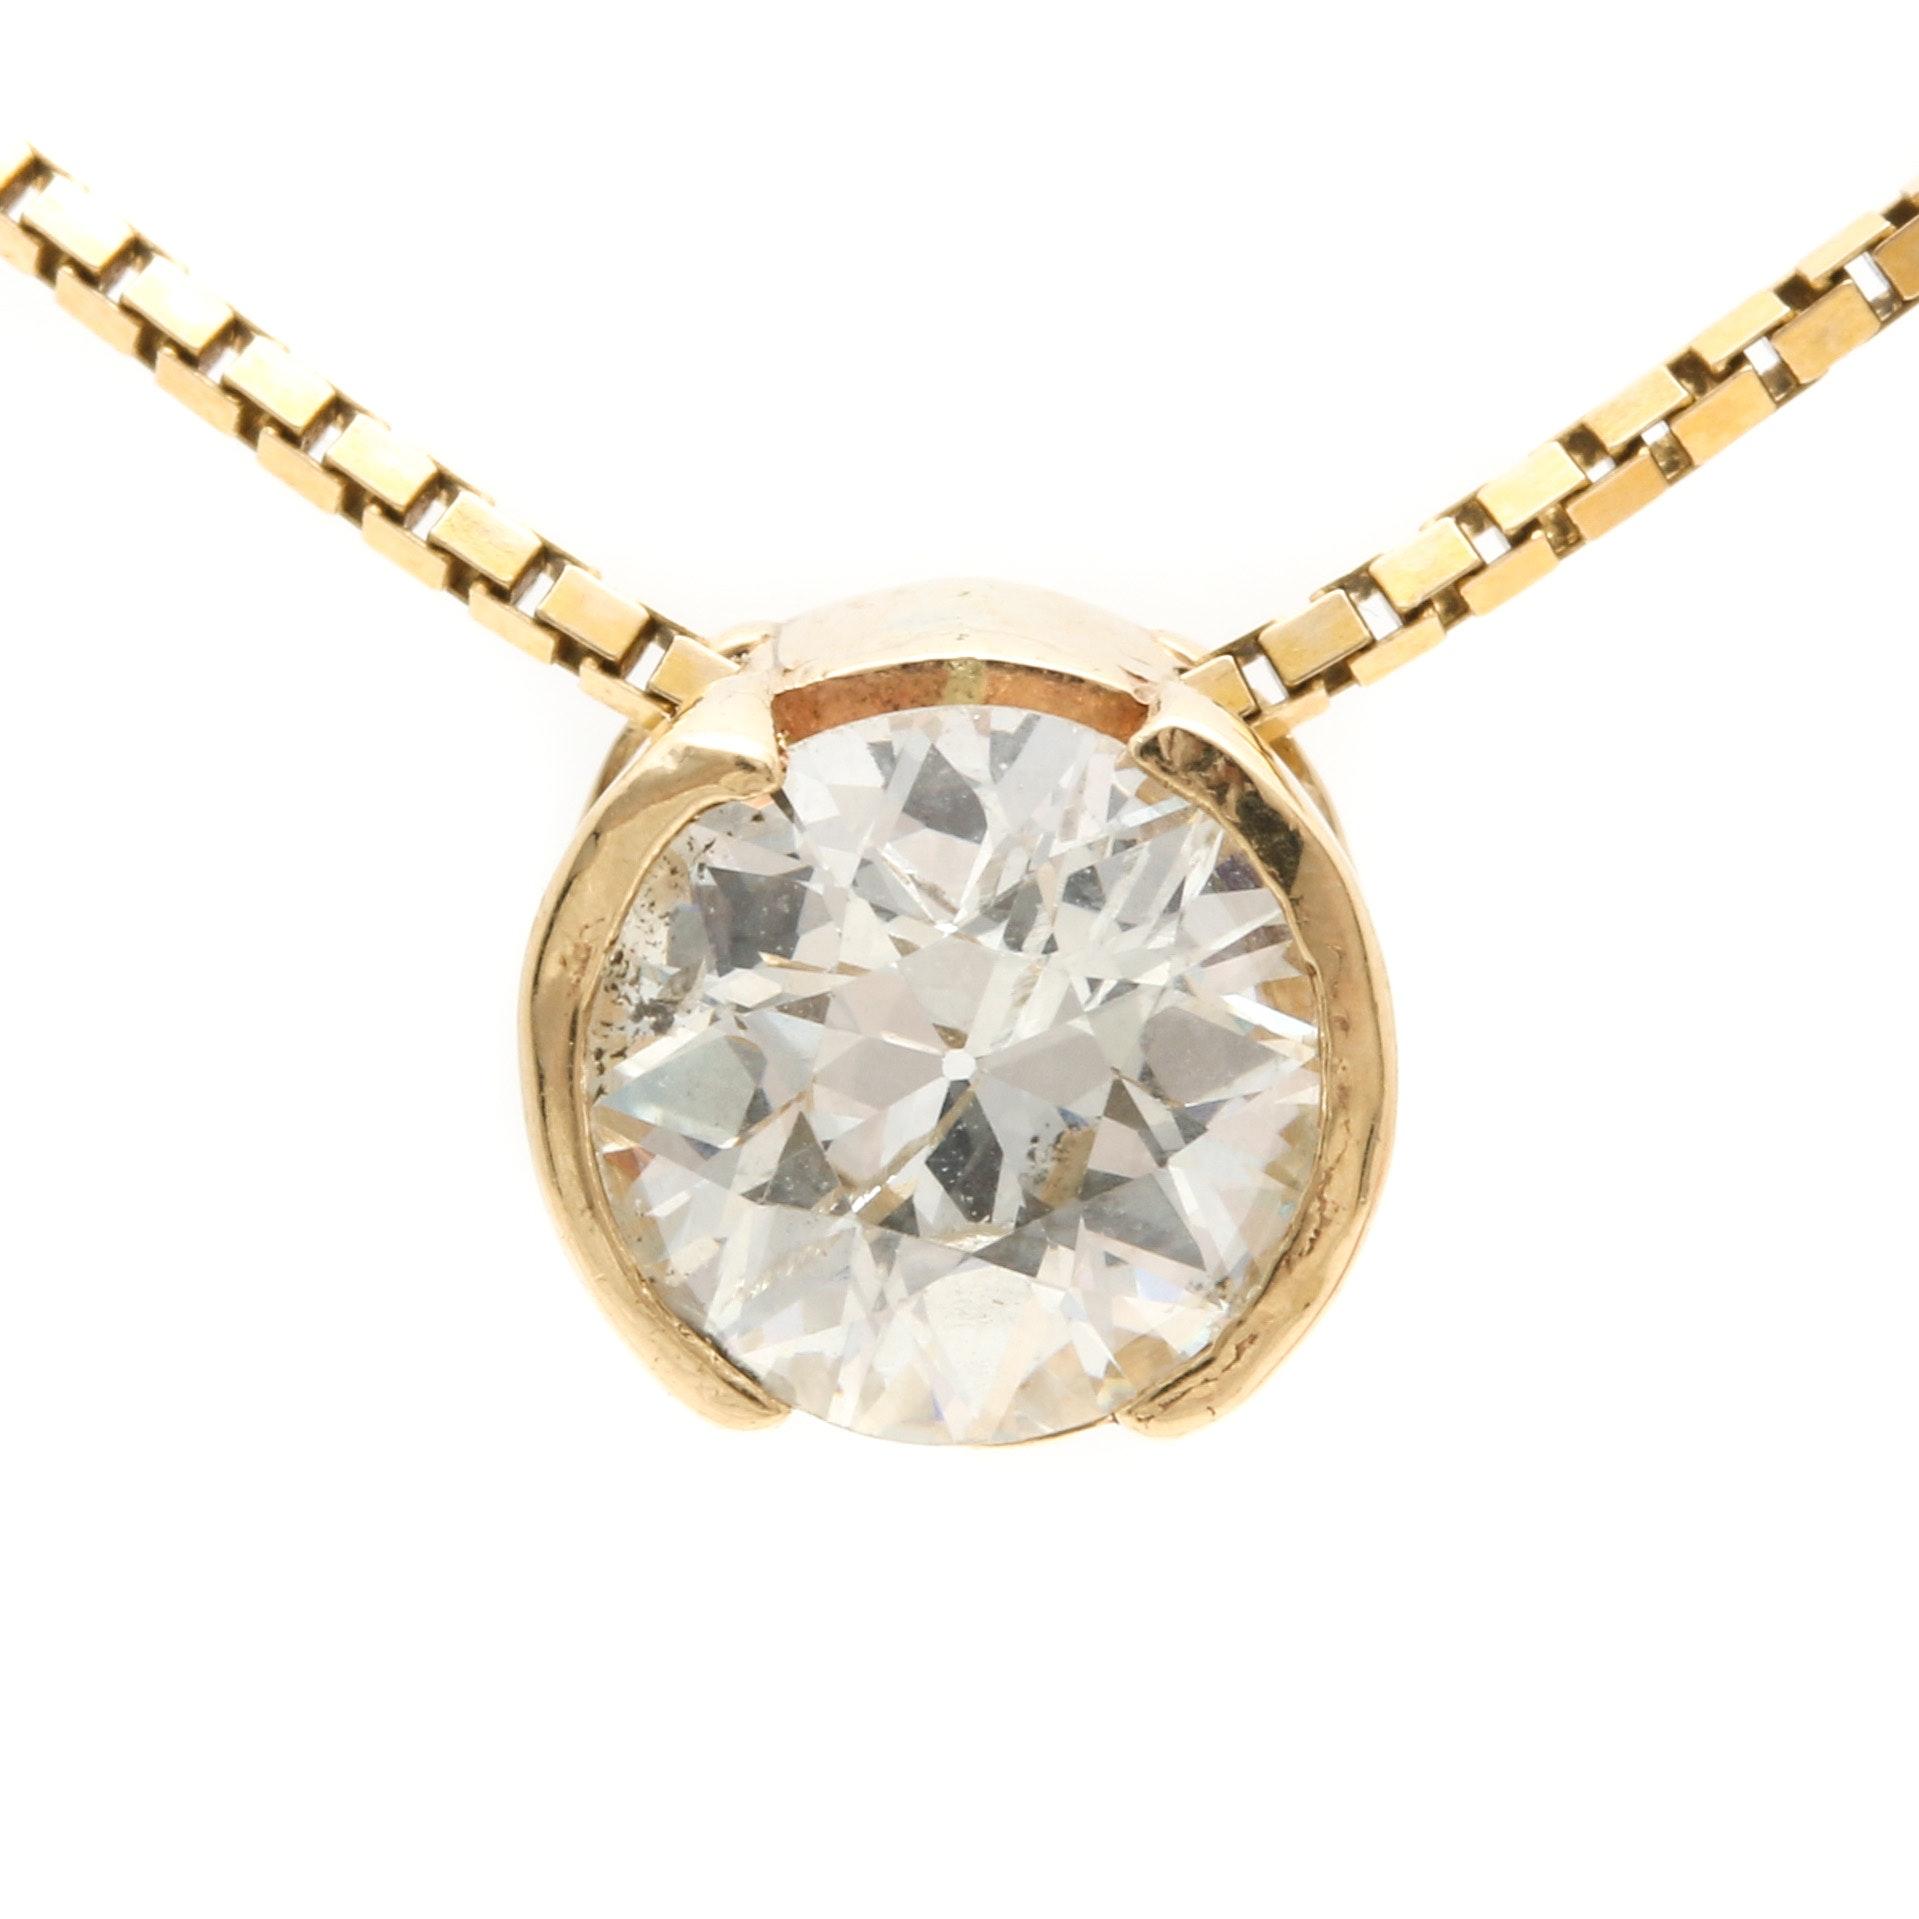 14K Yellow Gold 1.01 CT Diamond Pendant Necklace